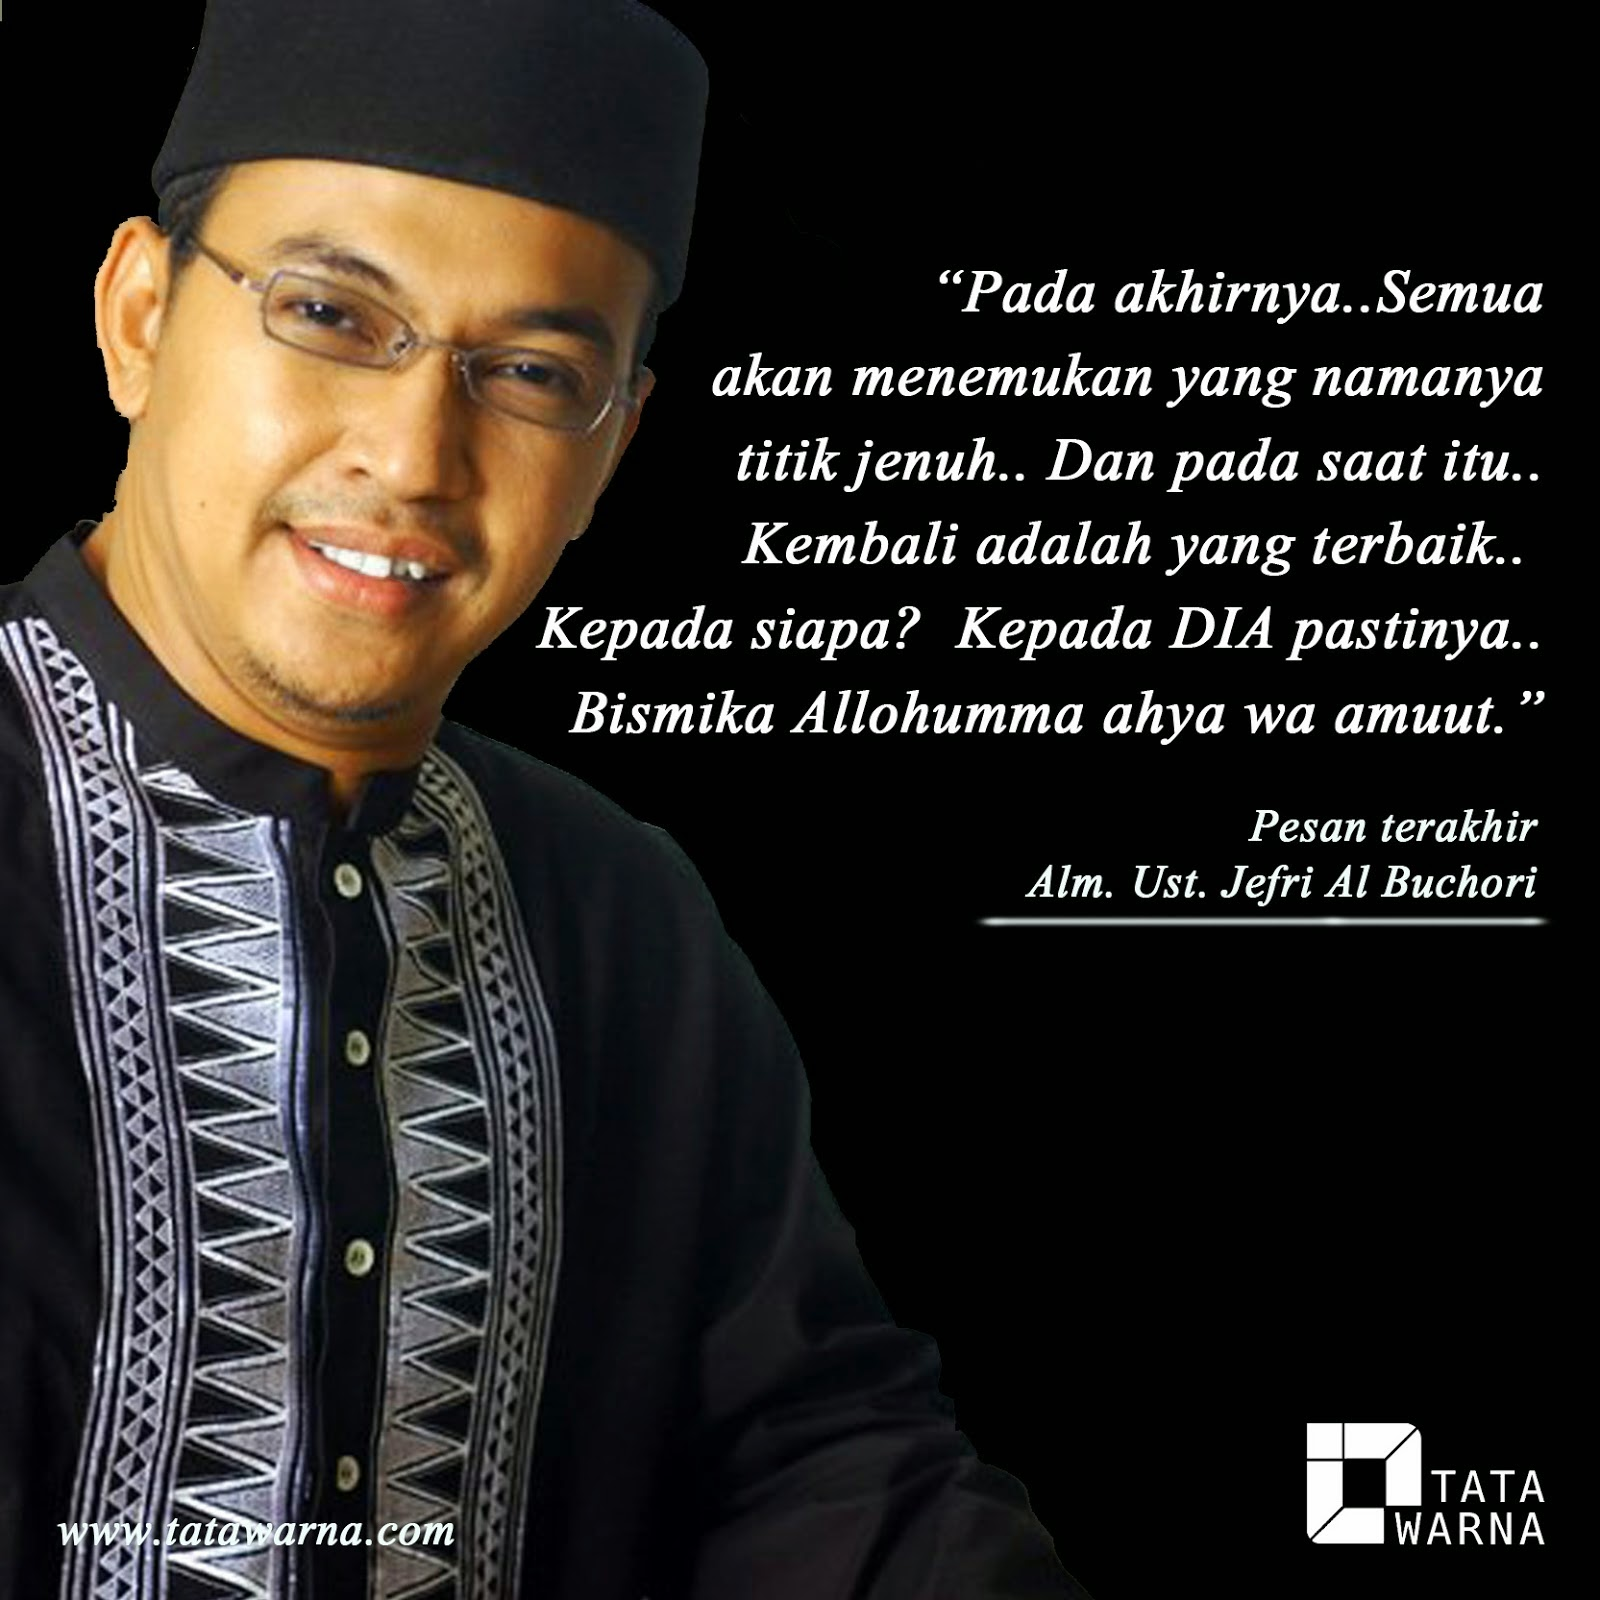 Kata Kata Mutiara Ustad Jefri Al Buchori Islam Itu Indah